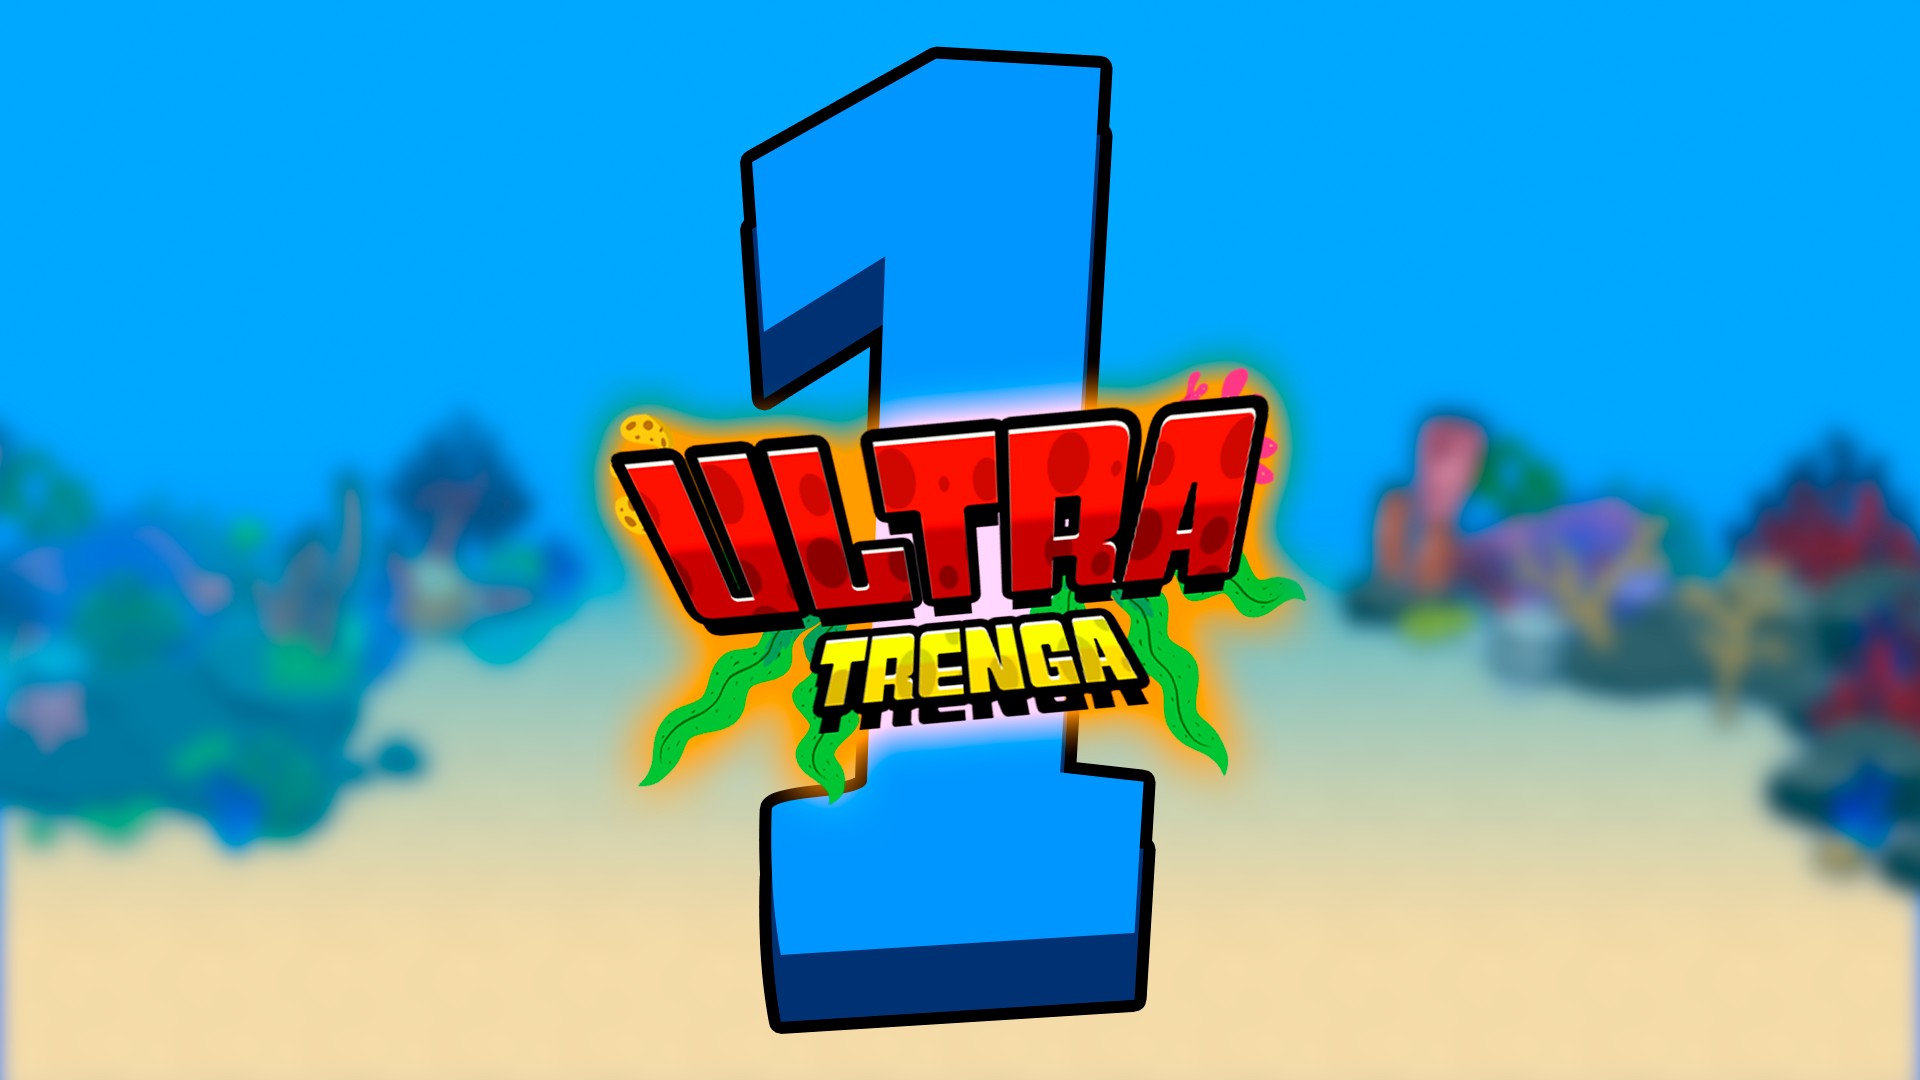 Icon for Ultra Trenga